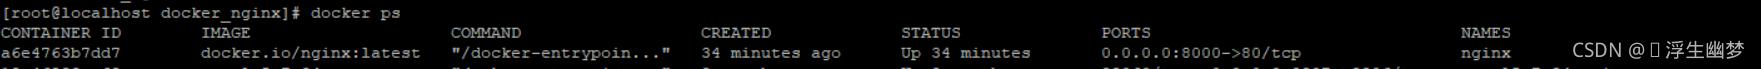 Docker配置nginx文件(图片)访问代理